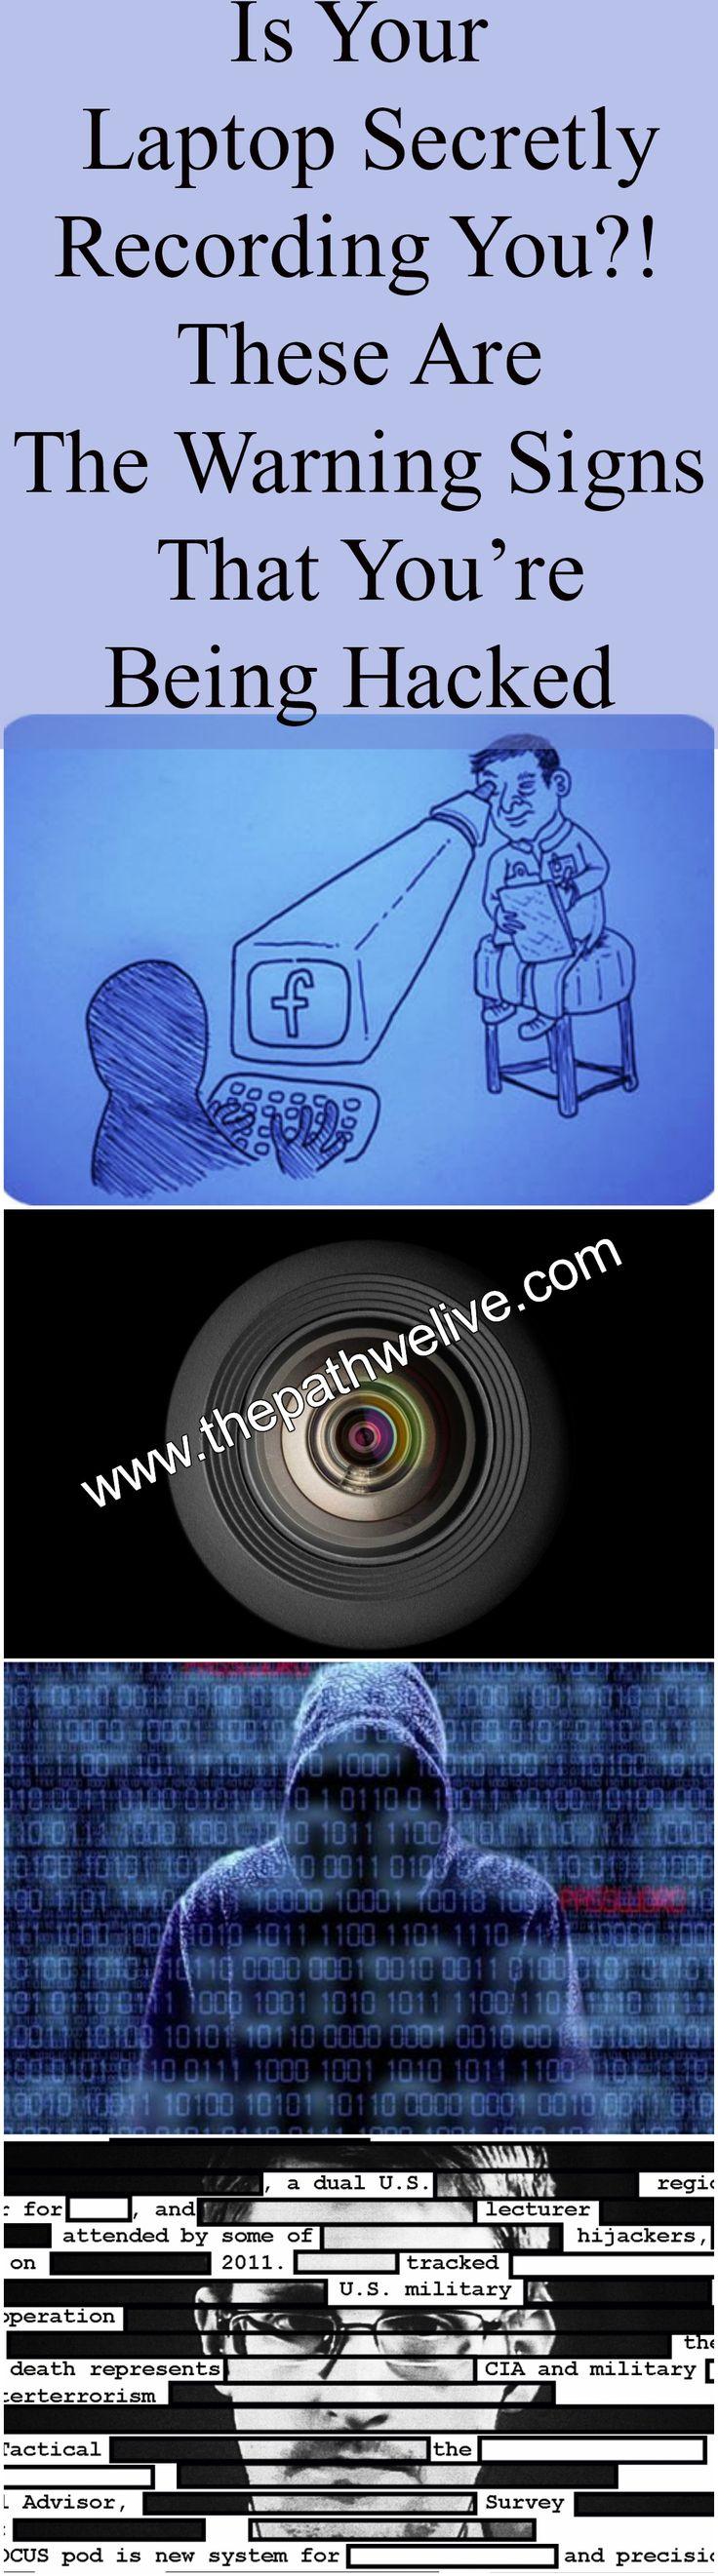 #Laptop #Computer #Recording #Hacking #Signs #Digital